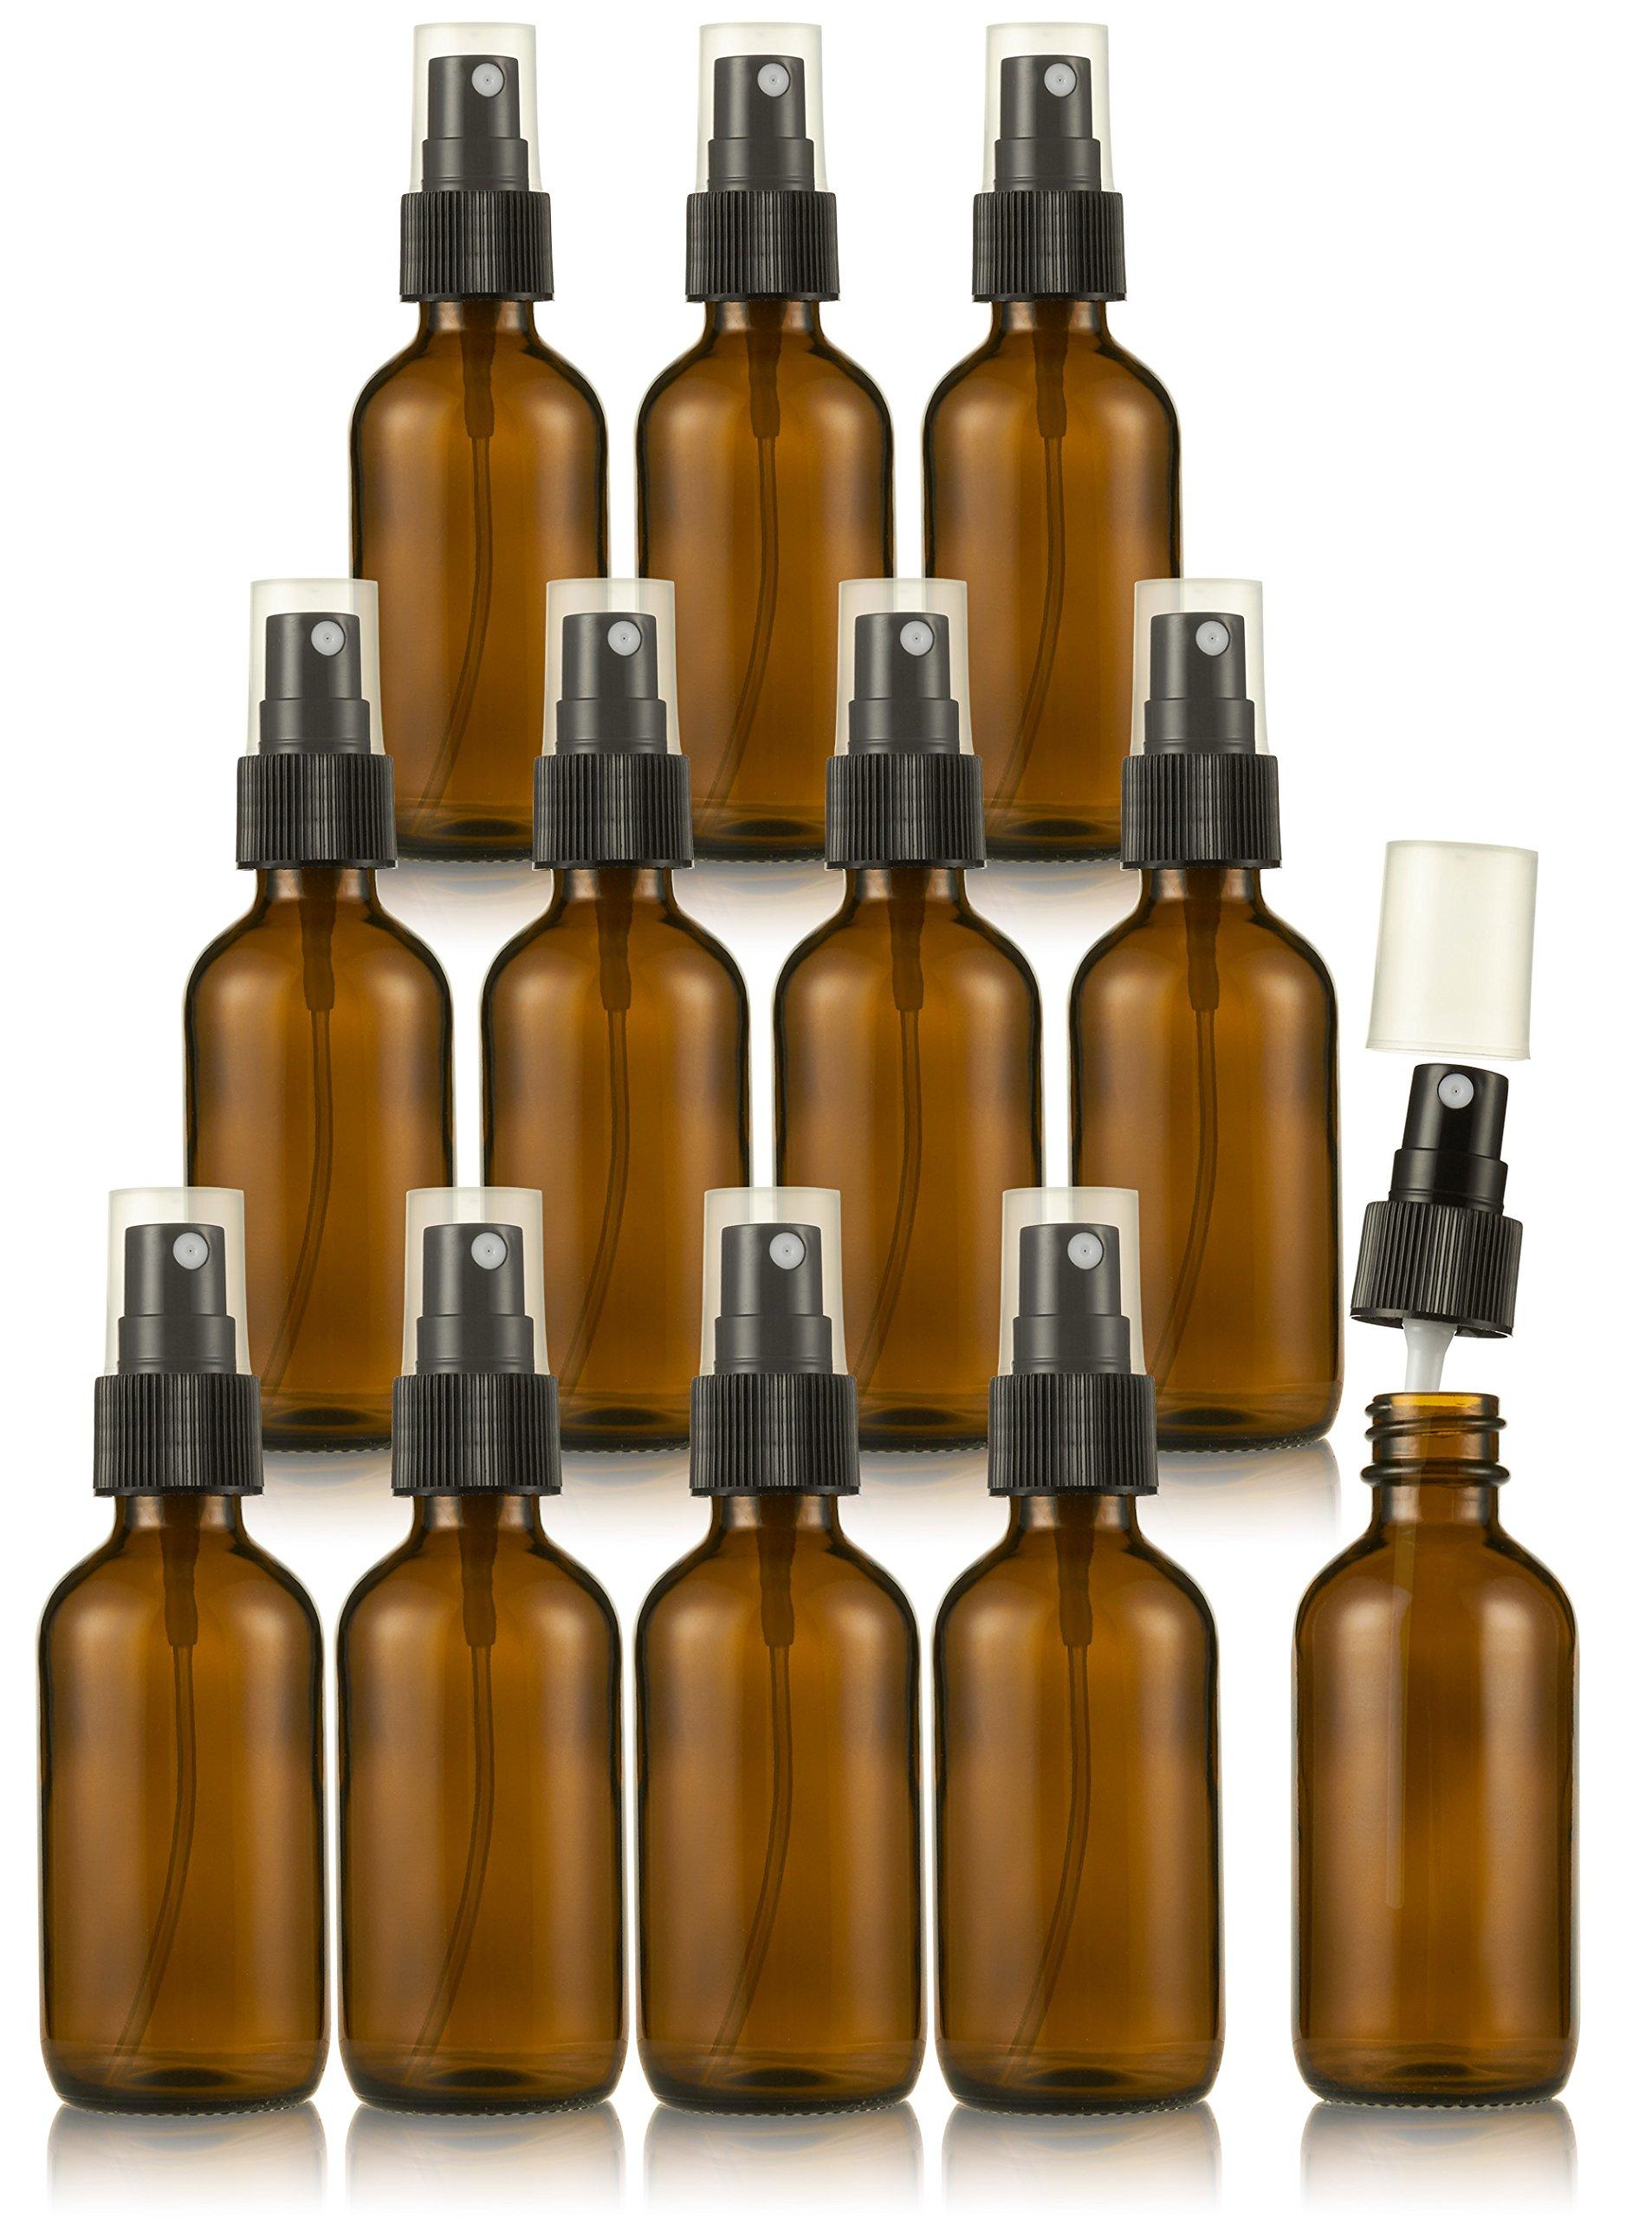 Amber Glass Spray Bottles - 12-Pack Boston Round Fine Mist Bottle with Atomizer Pump - Refillable Misting Sprayer Glass Bottle for Light Liquid, Essential Oils, Aromatherapy, Perfumes, Travel - 2 oz